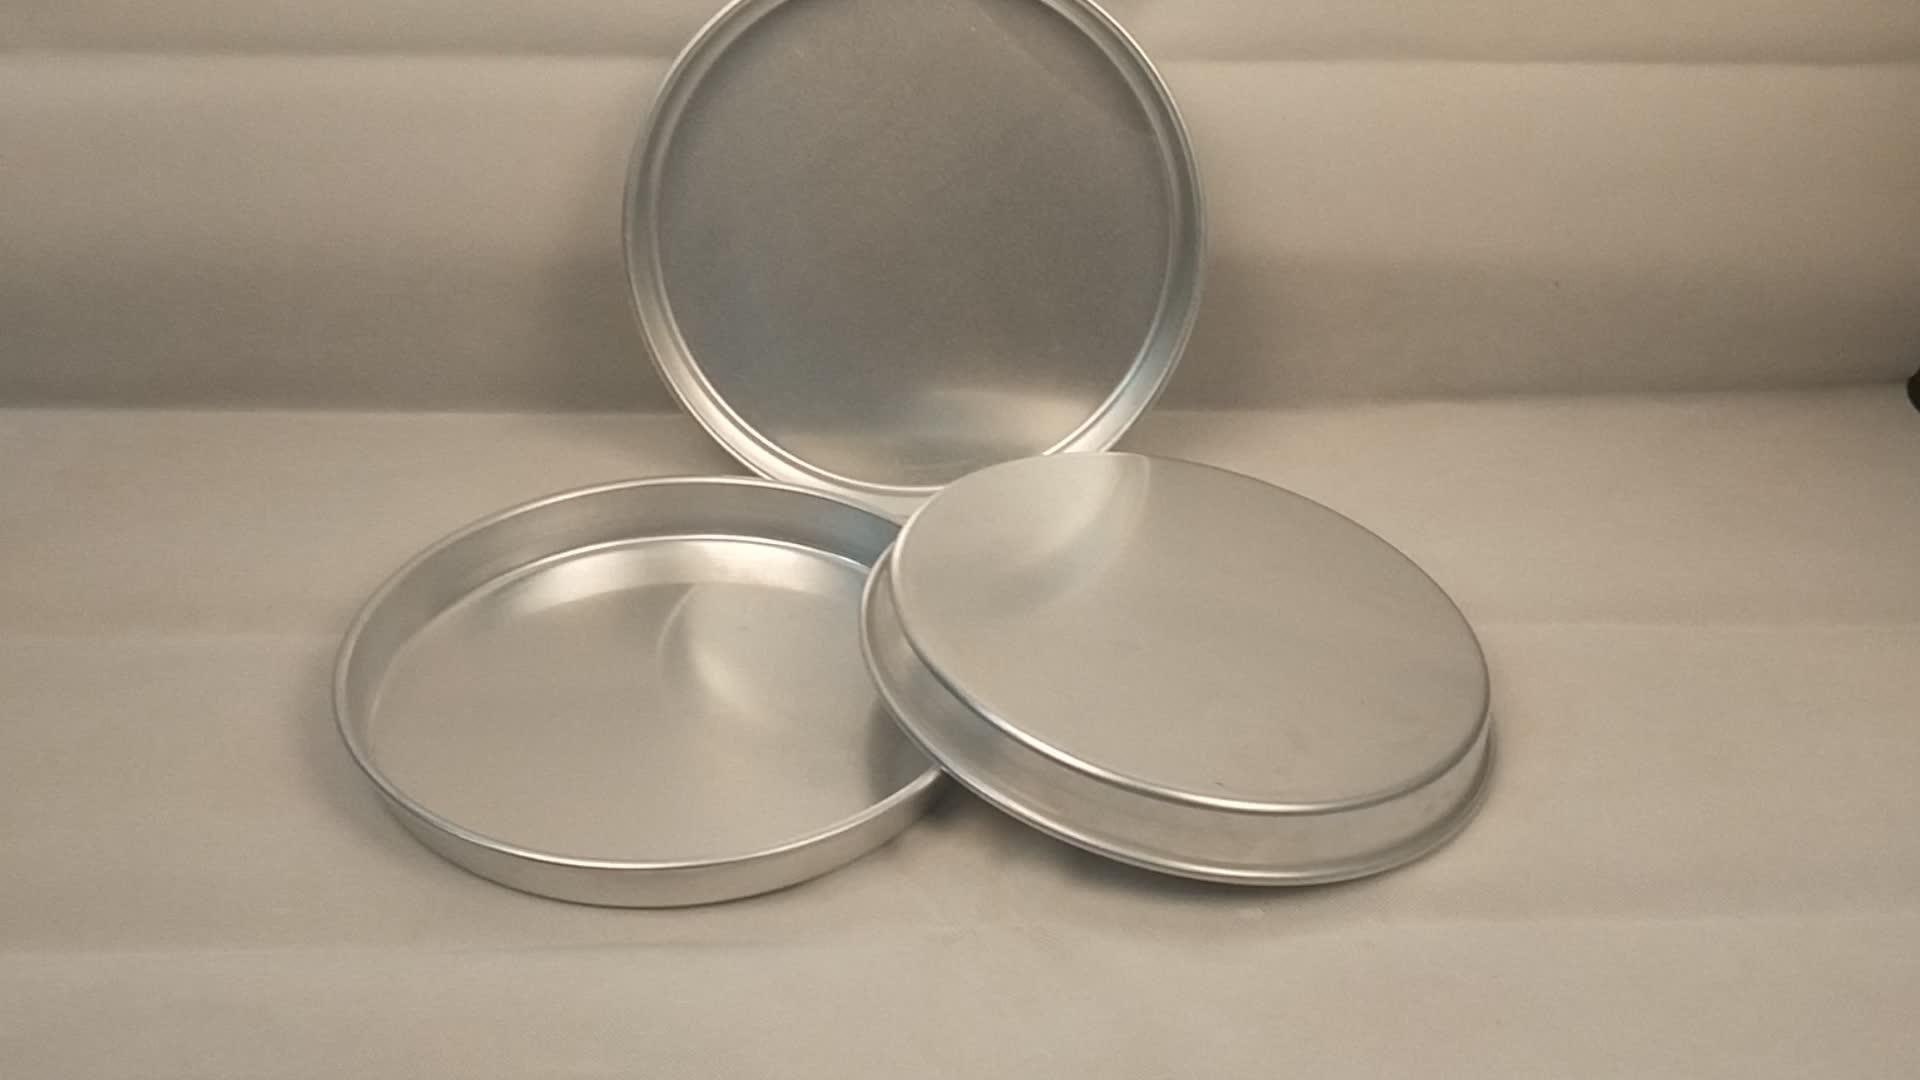 आकार-अनुकूलित एल्यूमीनियम पाक दौर केक पैन/ढालना माइक्रोवेव ओवन के लिए-6 इंच